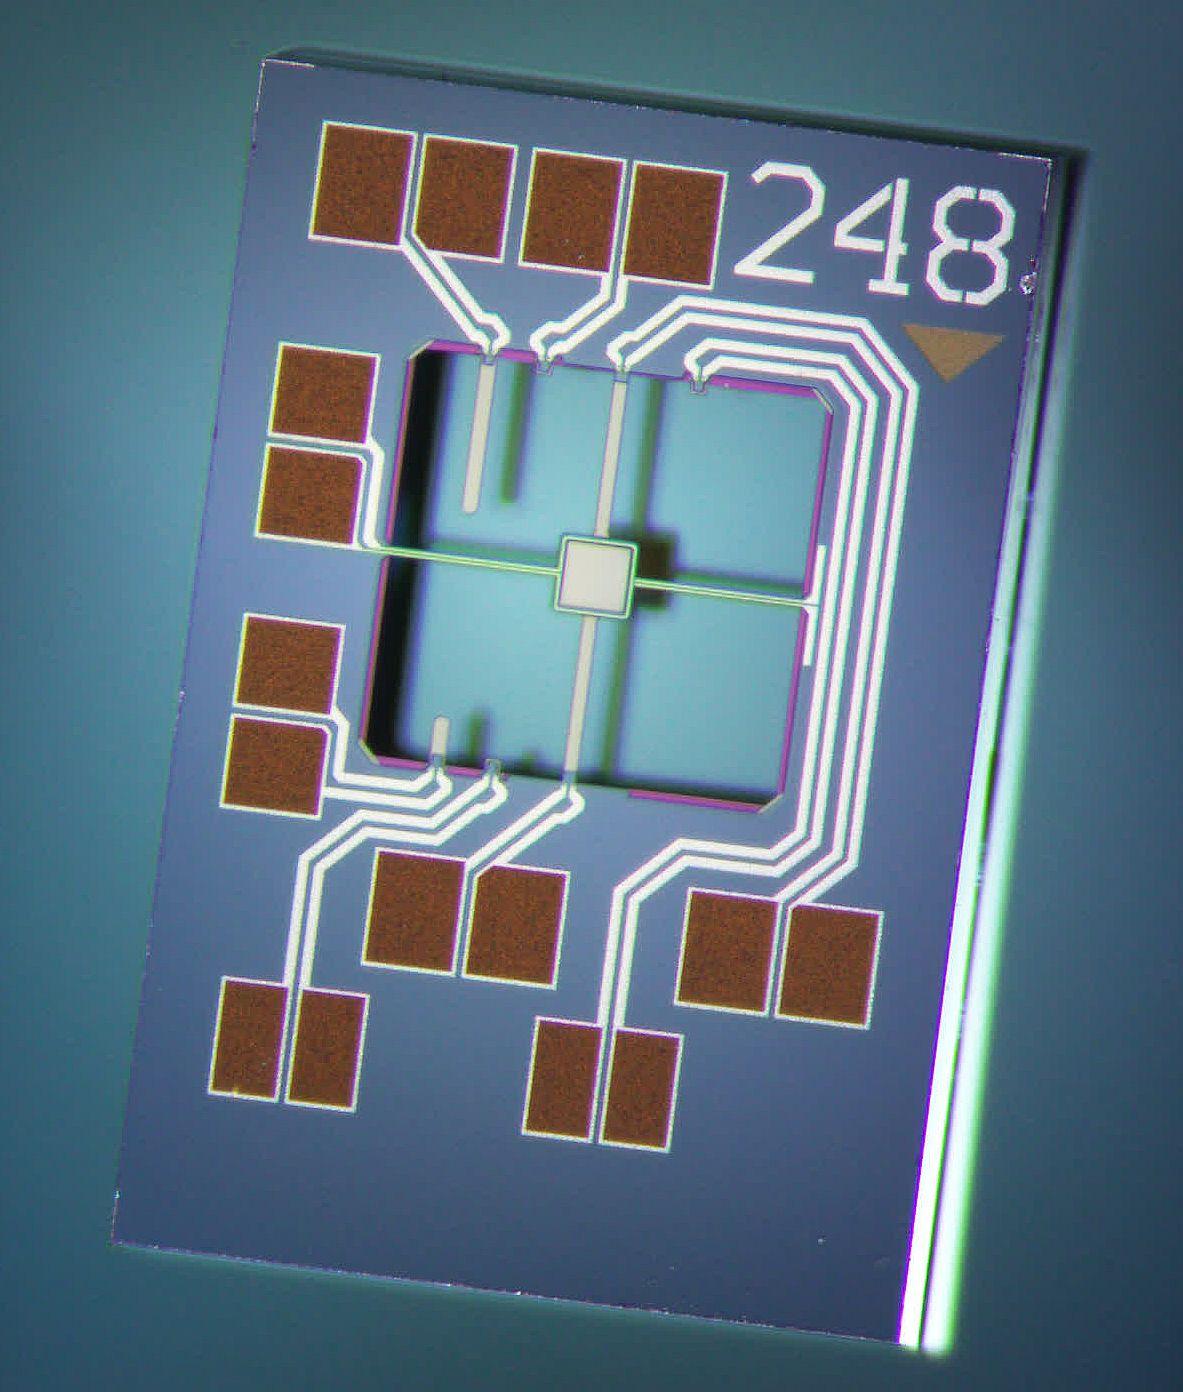 NANOSENSORS Membrane-type Surface-stress Sensor MSS for torque magnetometry SD-MSS-1KPMAu . Newly added to the NANOSENSORS Special Developments List